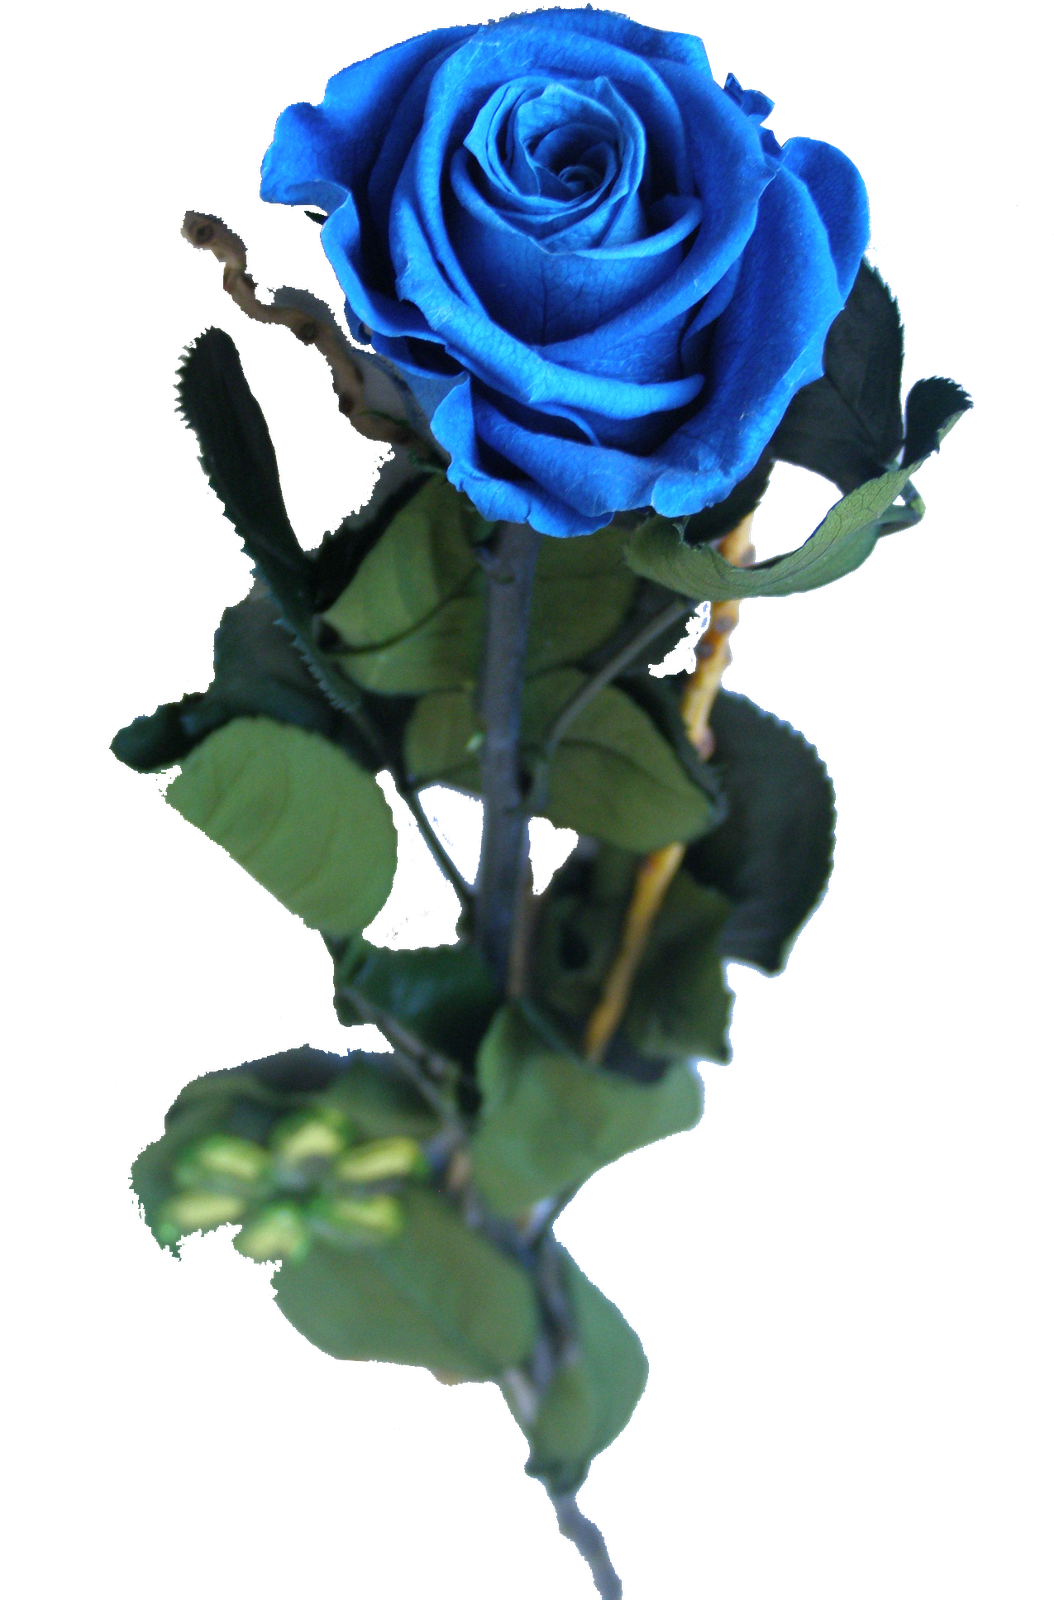 Pz C Puertas Exterior: PZ C: Rosa Azul